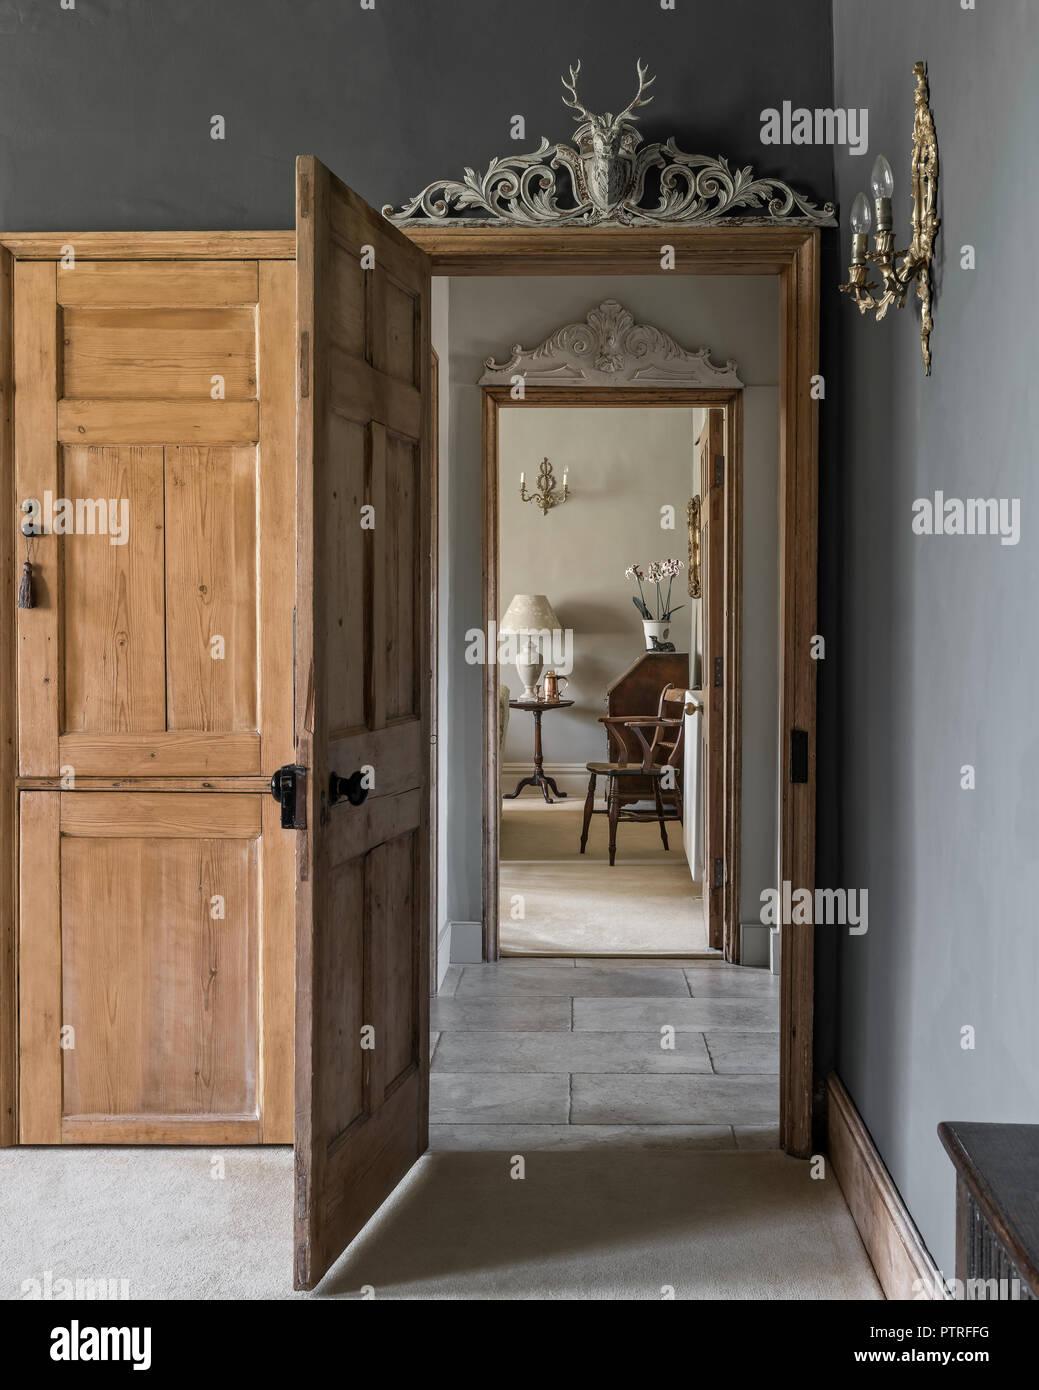 View through wooden doorway in restored Norfolk farmhouse - Stock Image